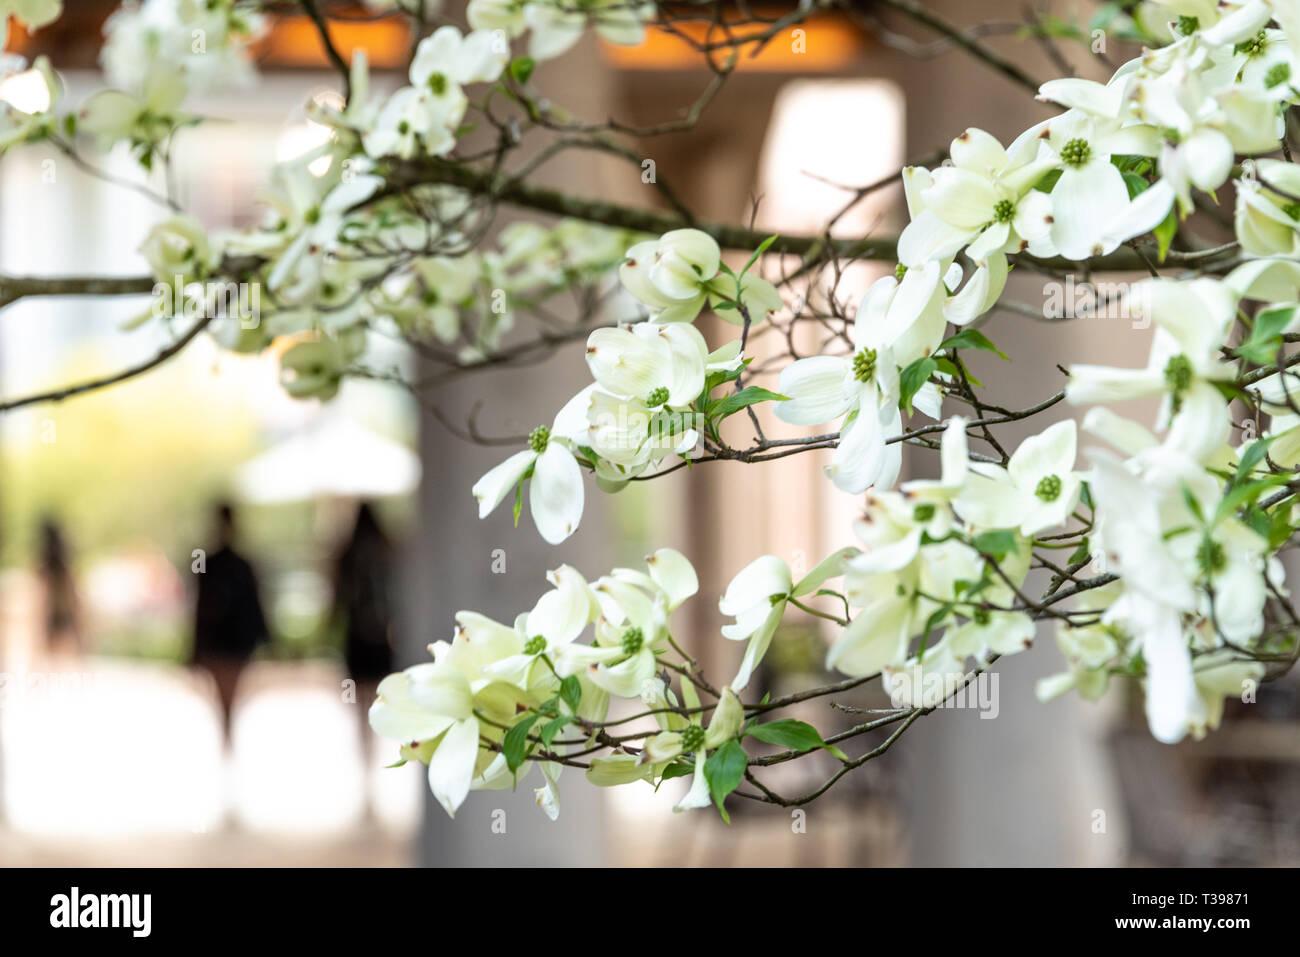 White dogwood blossoms announce springtime in Atlanta, Georgia on the campus of Emory University. (USA) Stock Photo